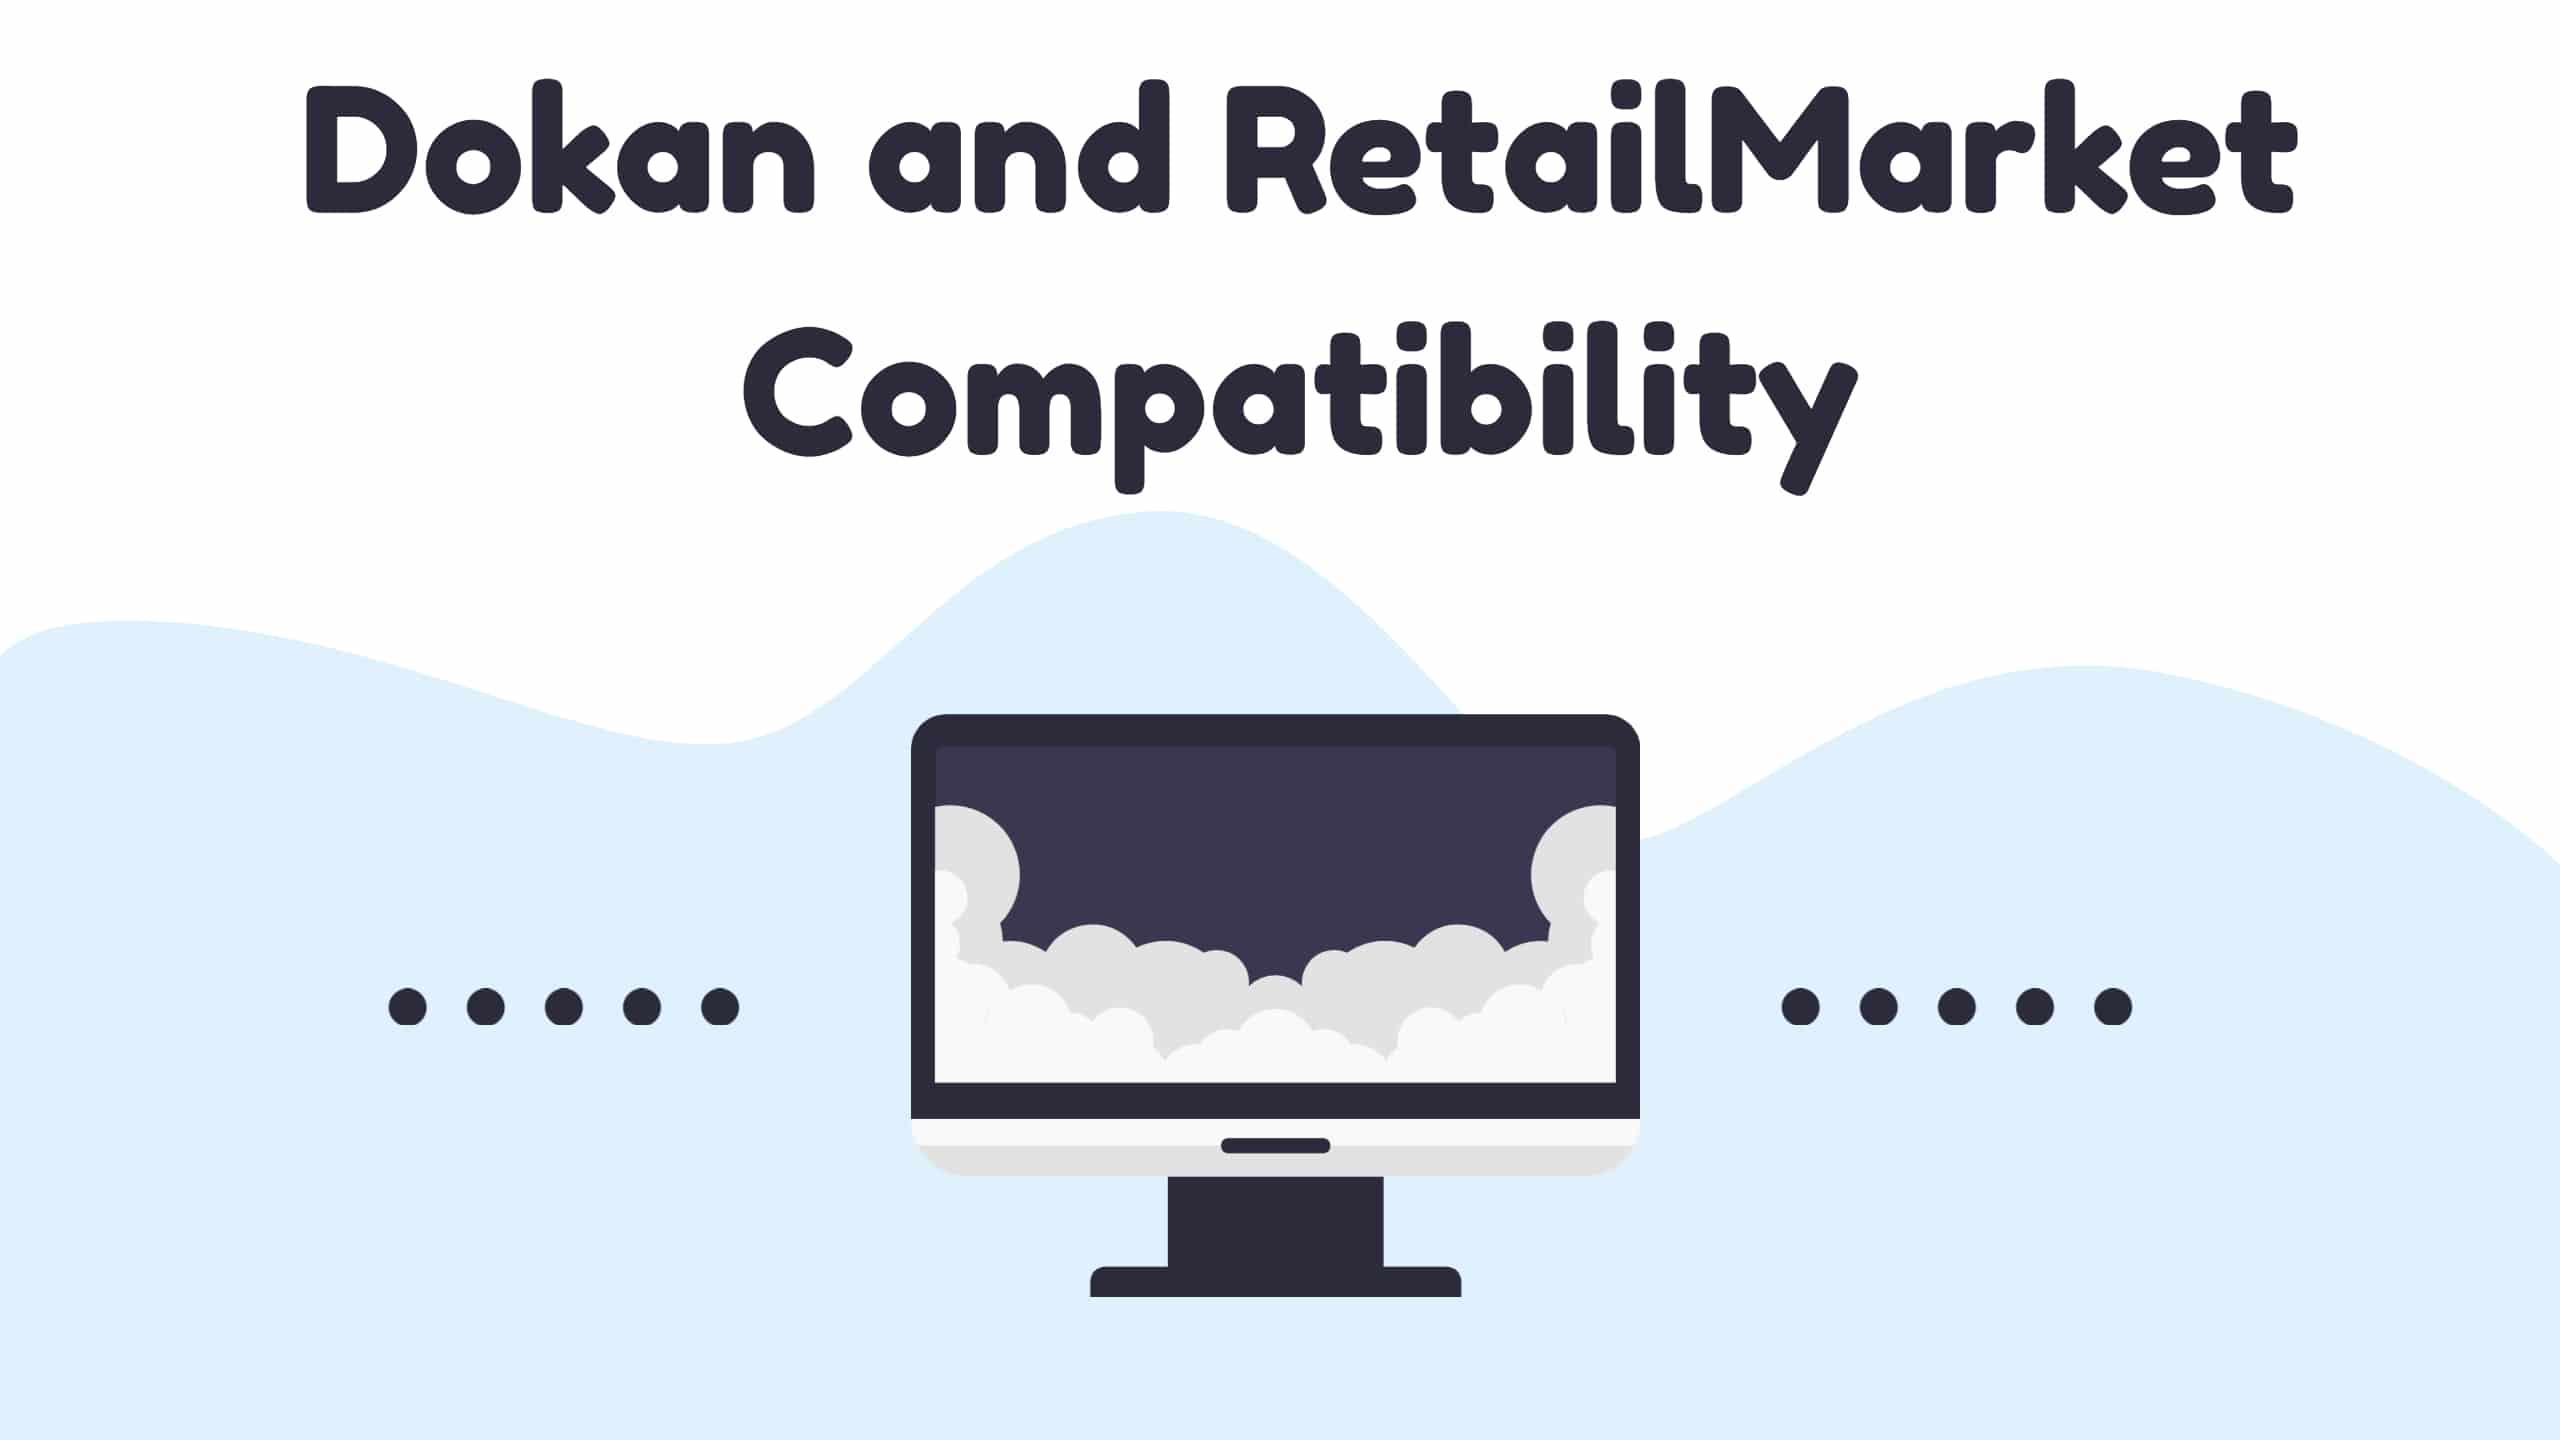 dokan and retailmarket compatibility